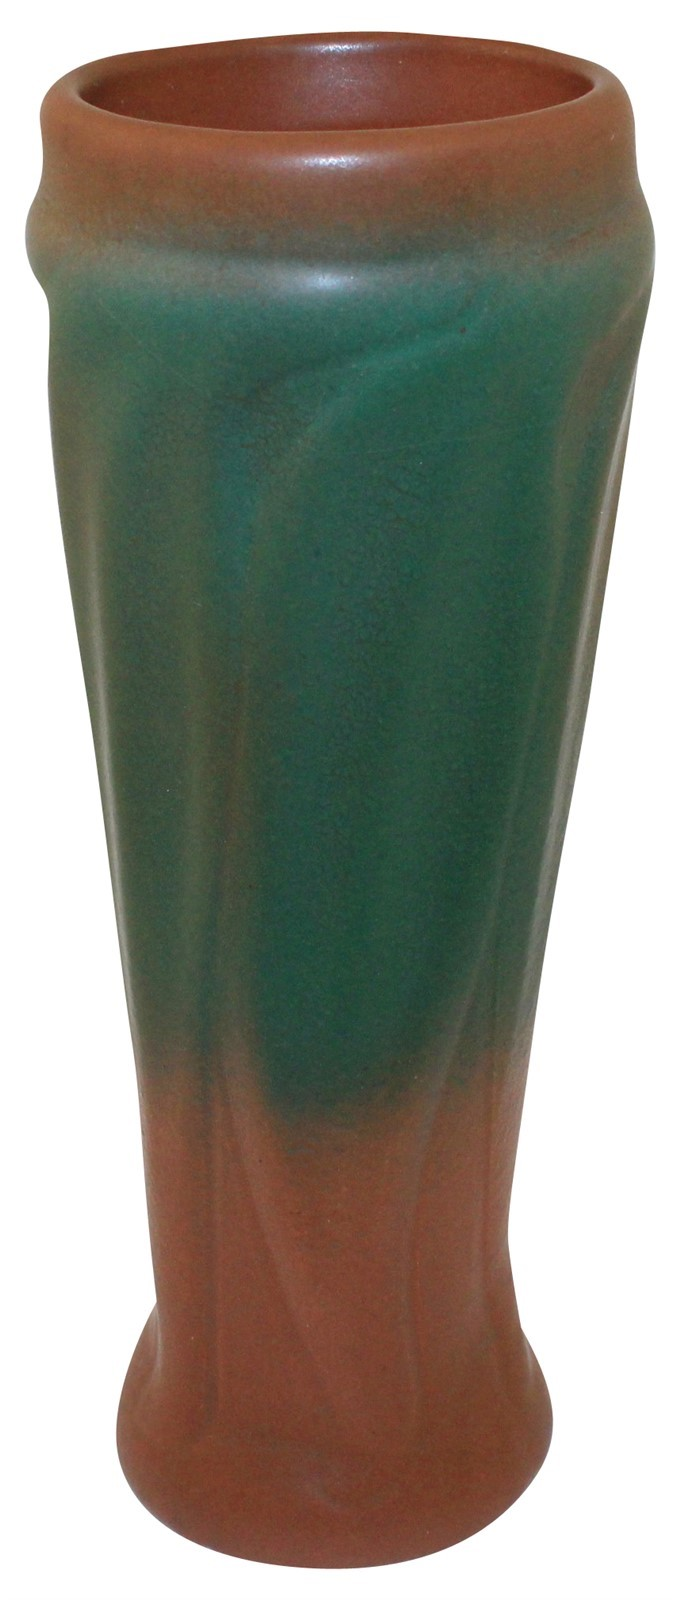 Van Briggle Pottery 1920s Mountain Crag Vase 863